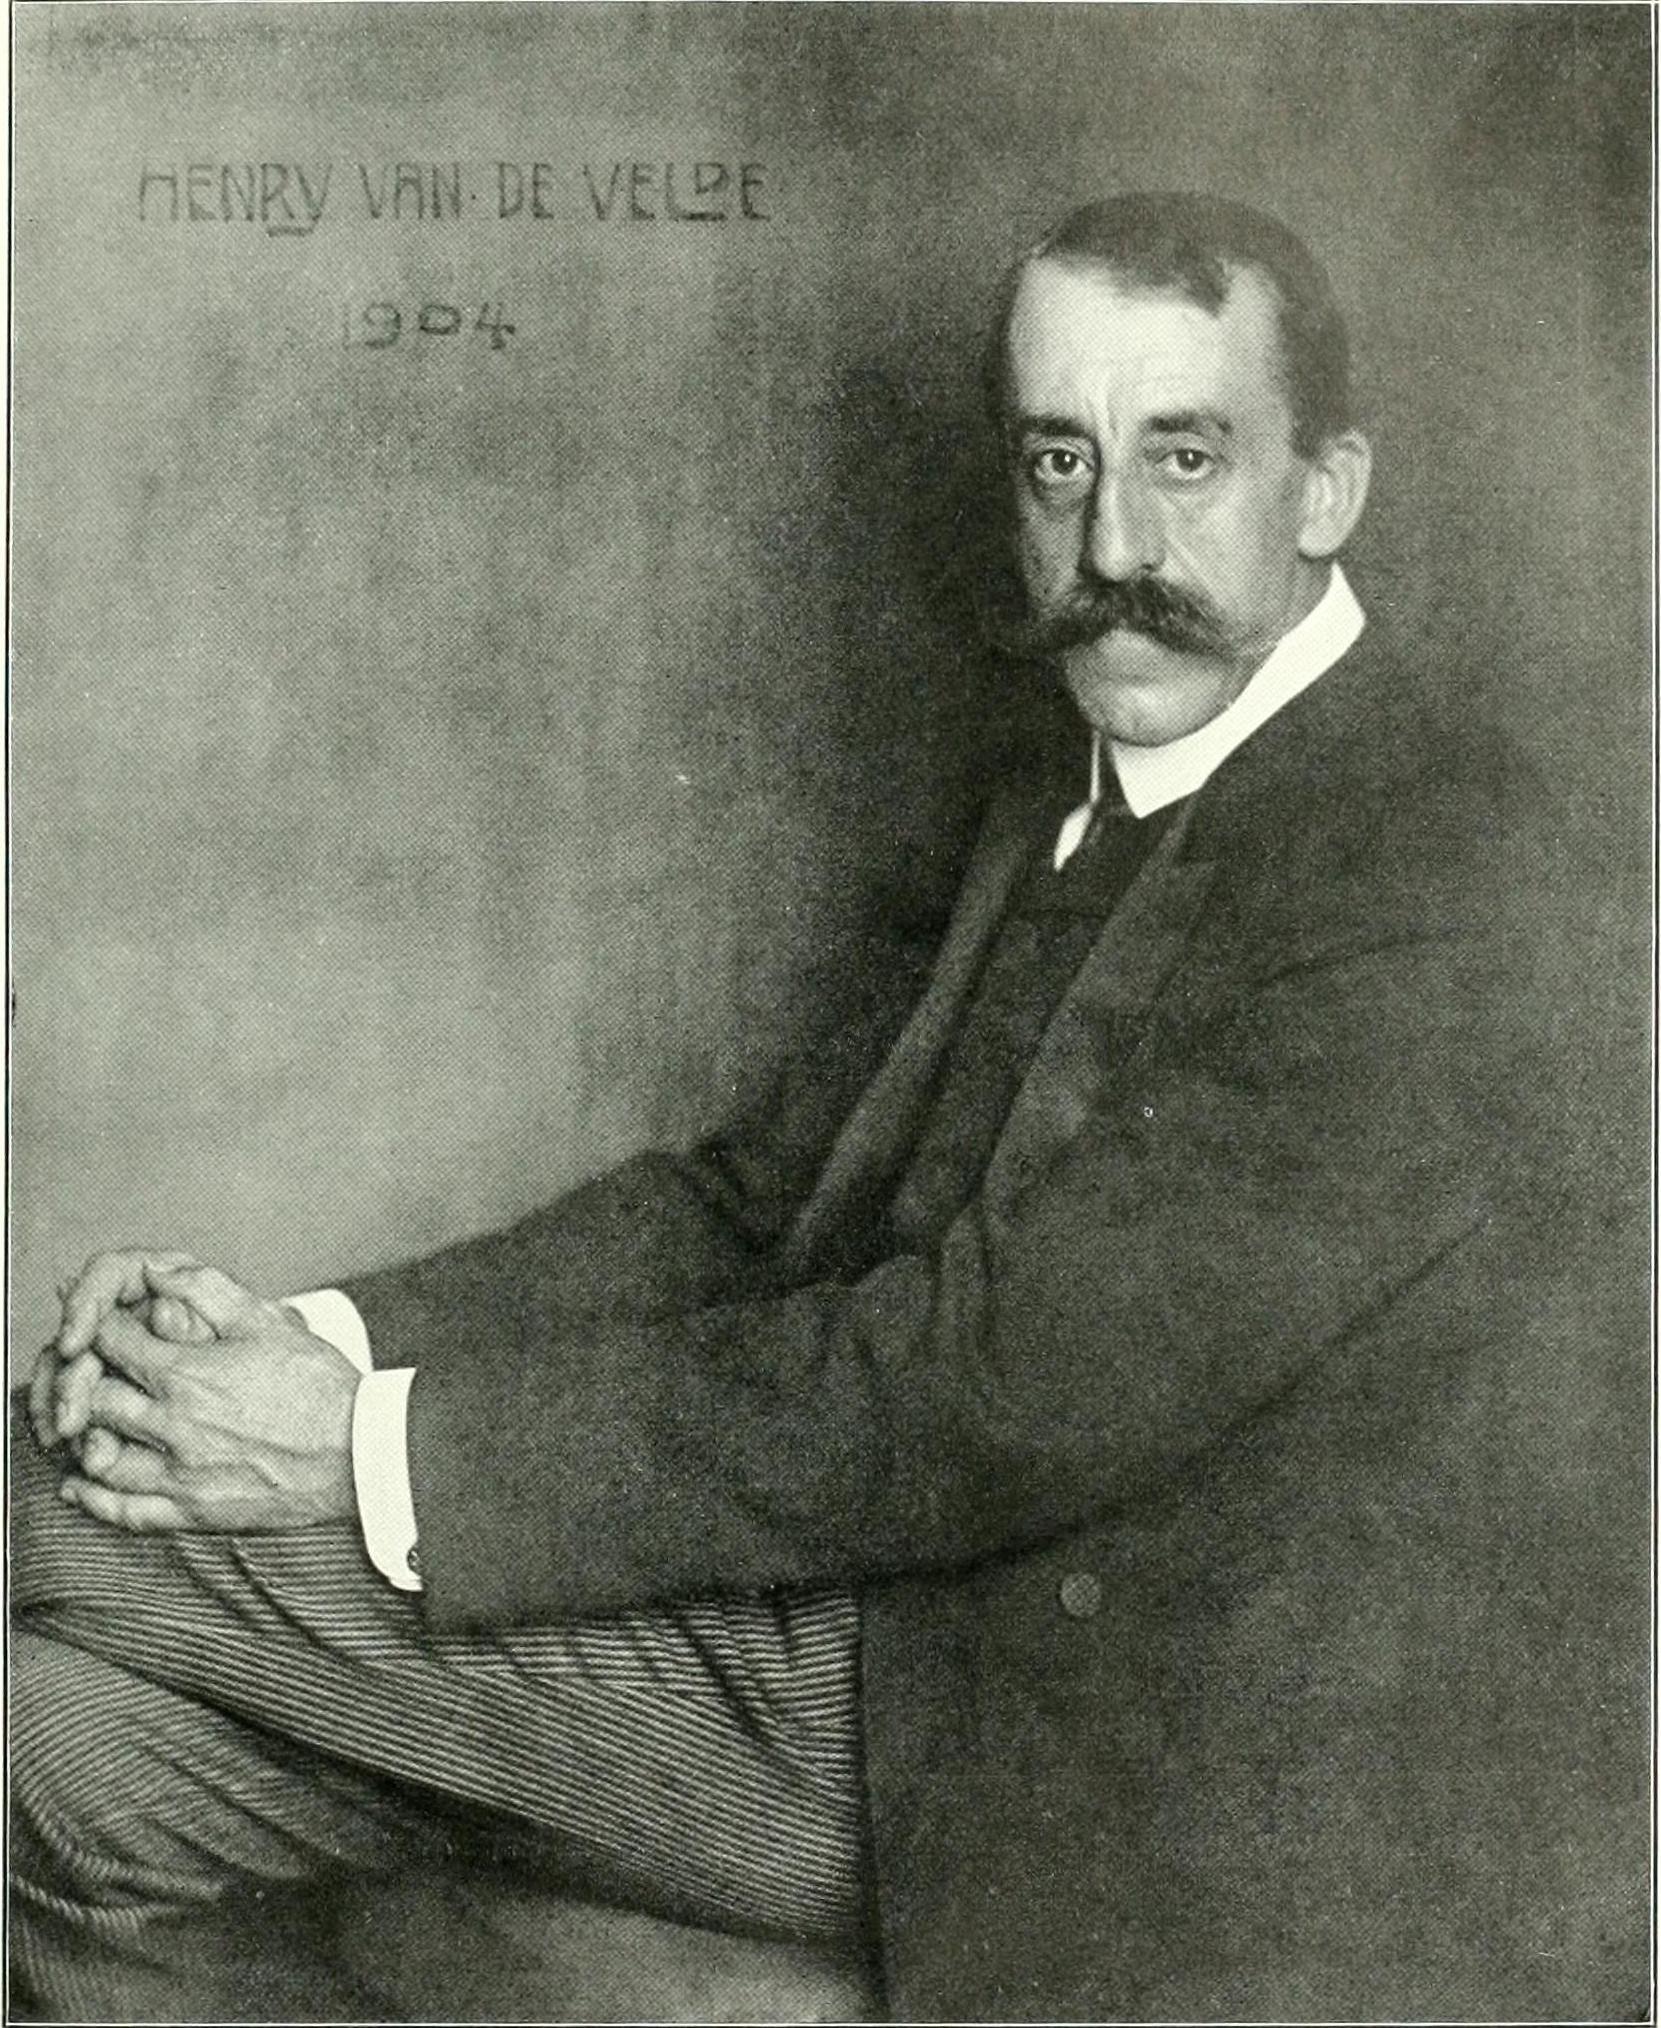 stowa - [REVUE] Stowa Antea Small Second : l'horlogerie à l'heure du Bauhaus Nicola_Perscheid_-_Henry_van_de_Velde_1904